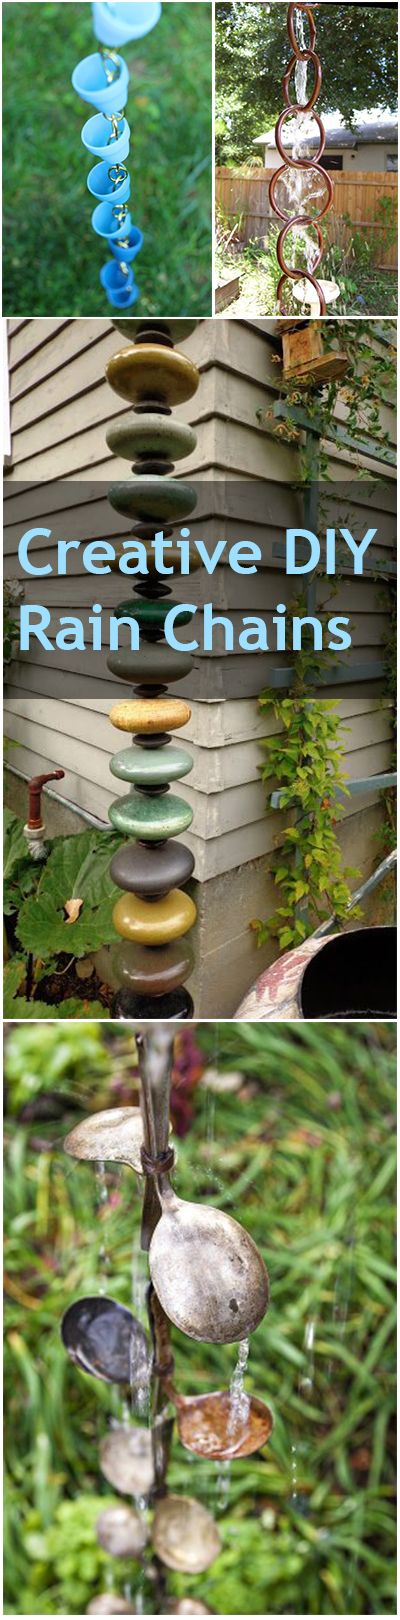 Creative DIY Rain Chains. DIY Rain Chains, Homemade Rain Chains, Gardening, Gardening Tips and Tricks, Outdoor DIY Projects, DIY Projects, Yard and Landscaping #garden #gardening #yardandlandscape #diygarden #outdoordiy